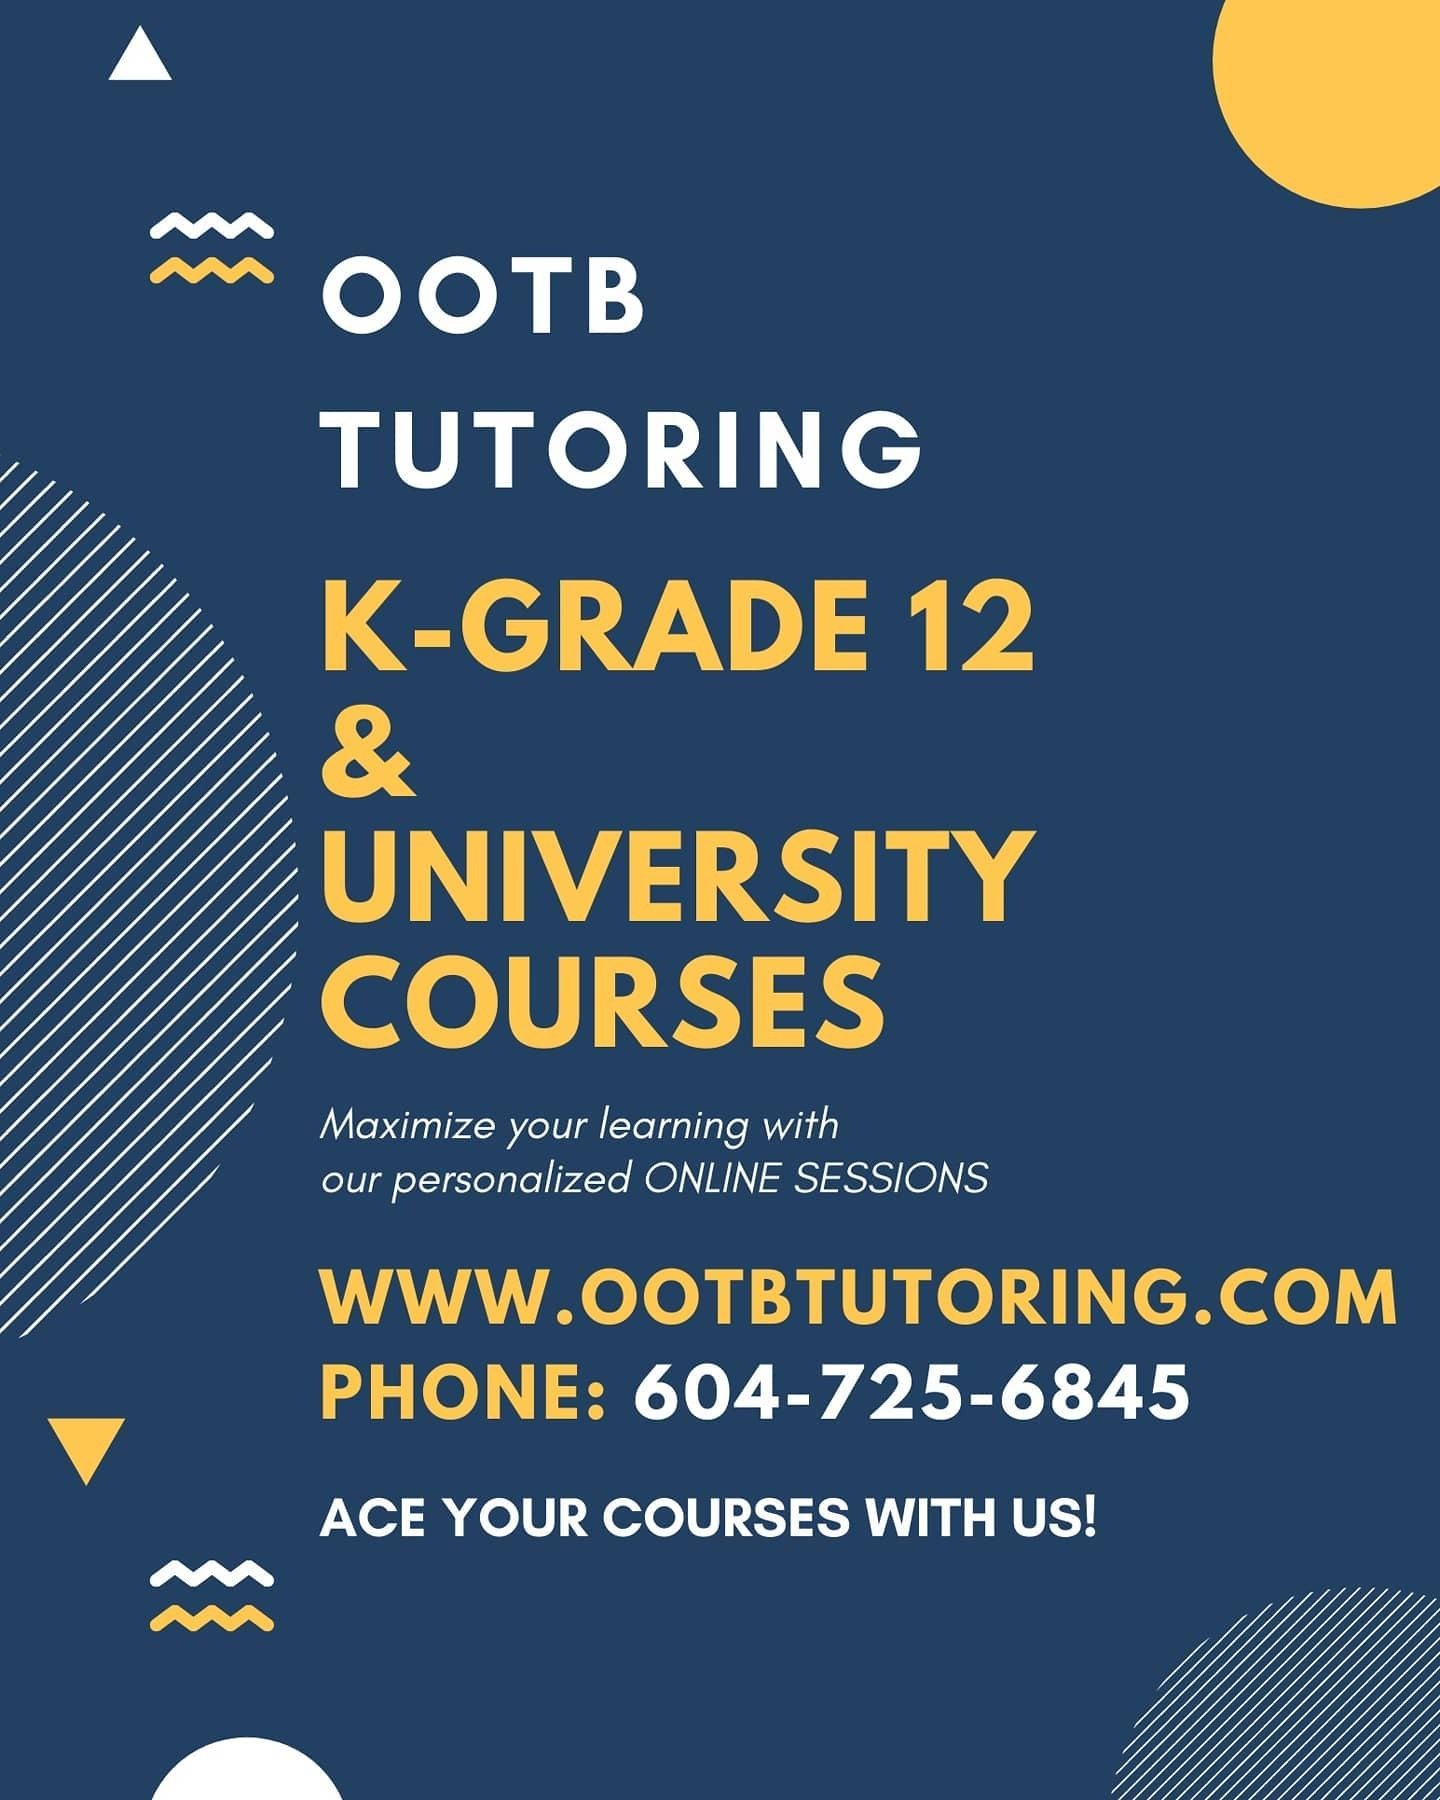 Affordable 1:1 & Group Tutoring | Math, Physics, Chemistry, & English 2